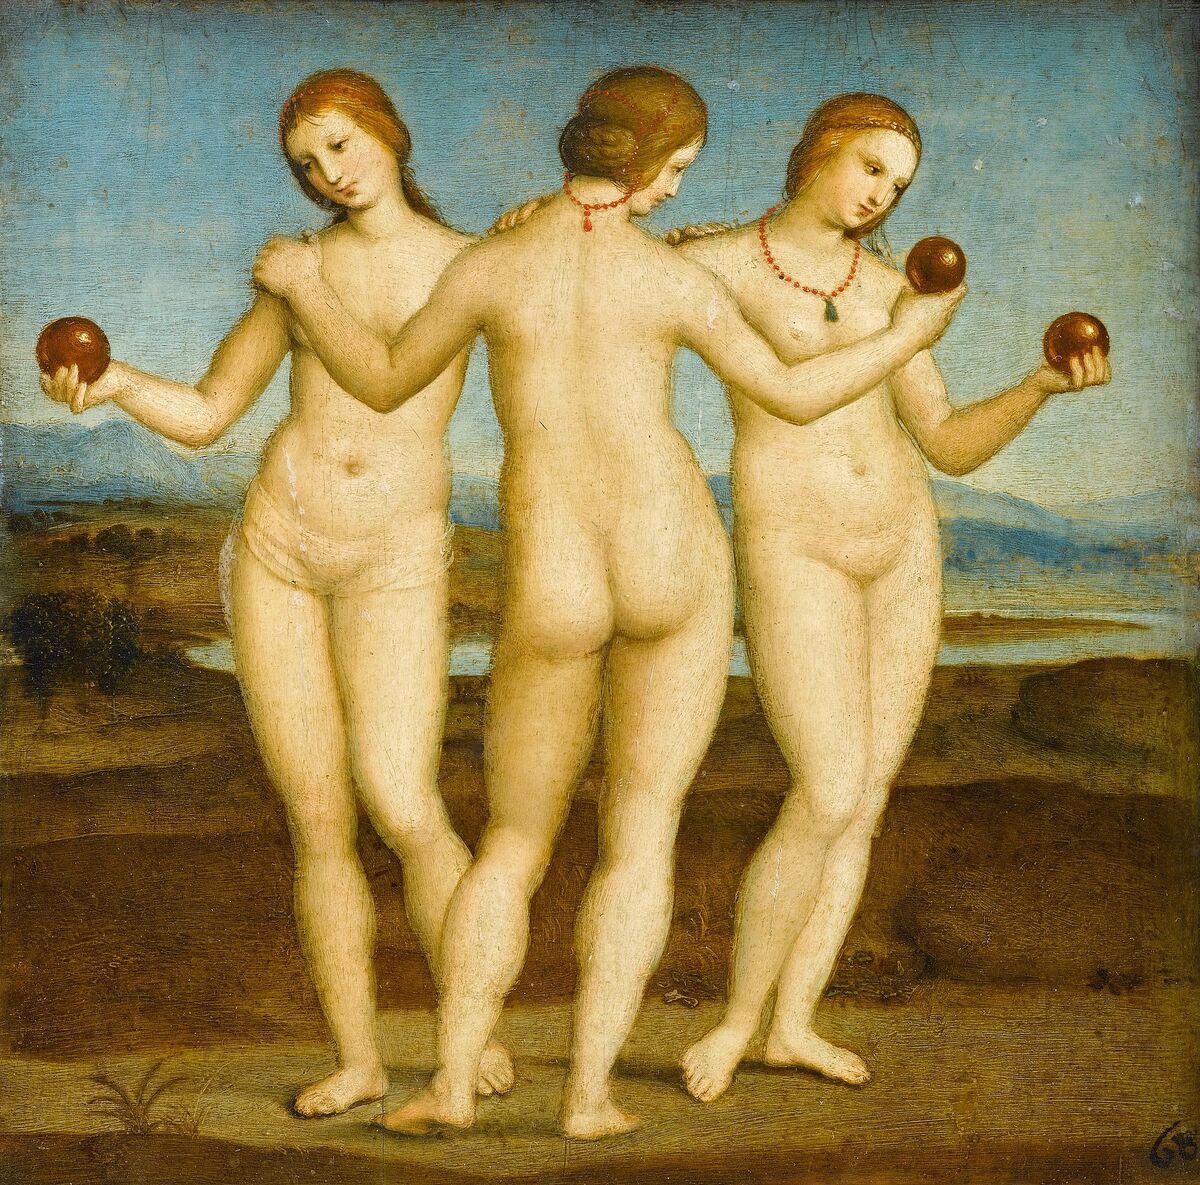 Rafael, Las tres gracias, 1504. Imagen a través de Wikimedia Commons.